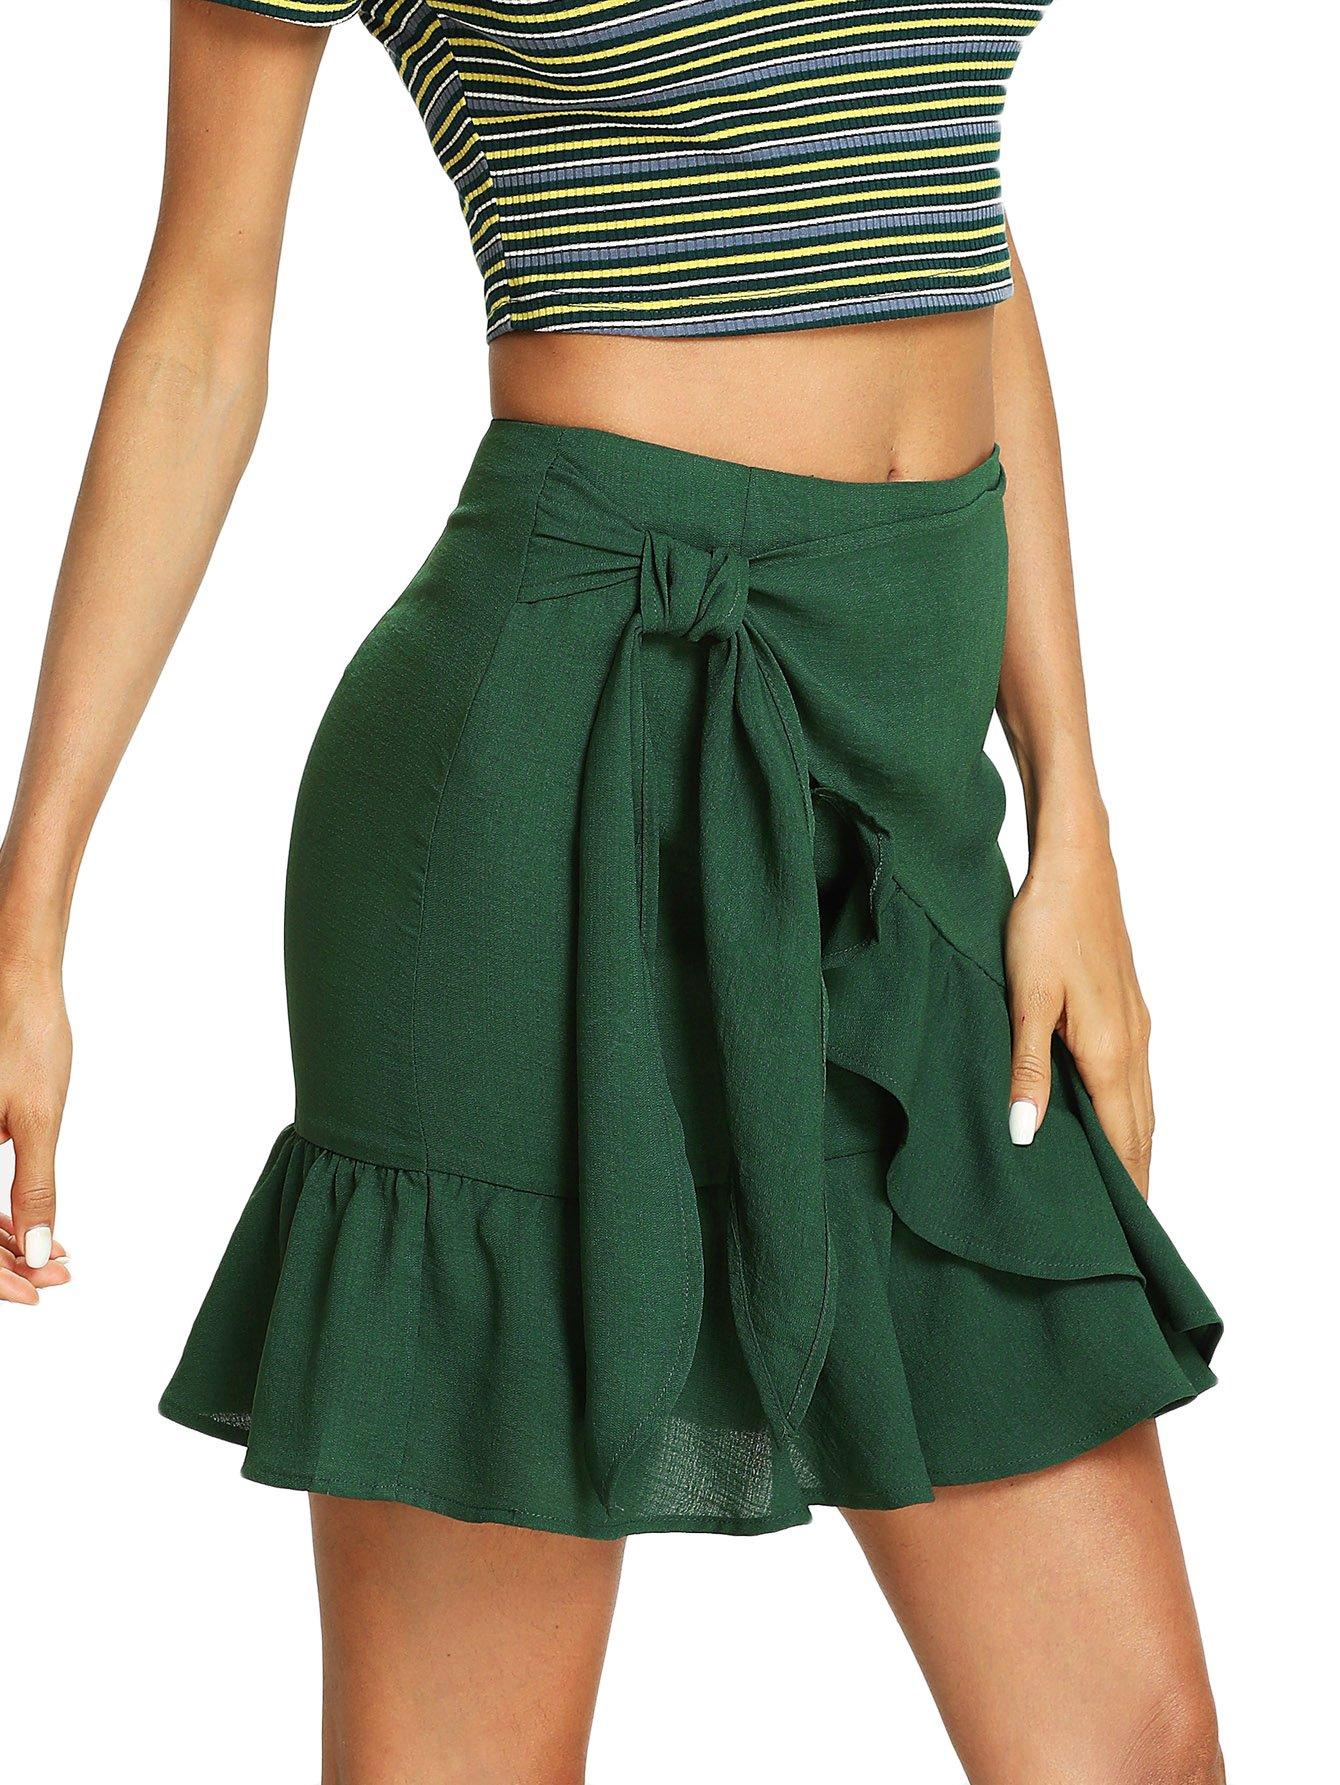 Romwe Women's Cute Knot Side Solid Ruffle Hem Mid Waist Summer Short Skirt Green L